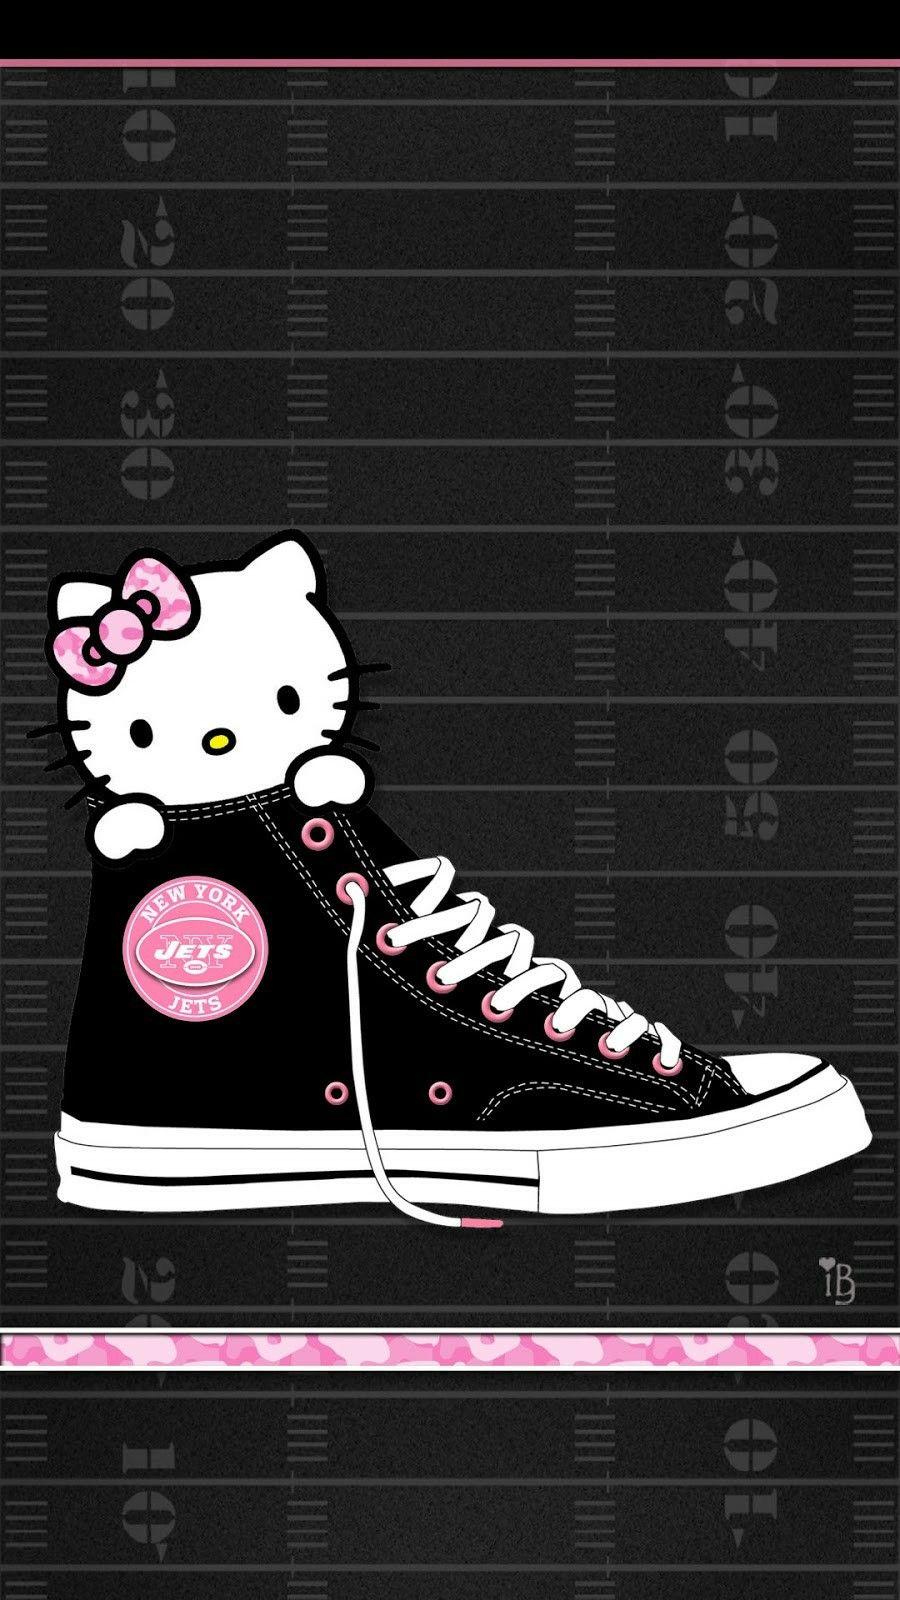 Popular Wallpaper Hello Kitty Apple - 57d24080bb1846d73d31addbd352fa81  Graphic_457442.jpg